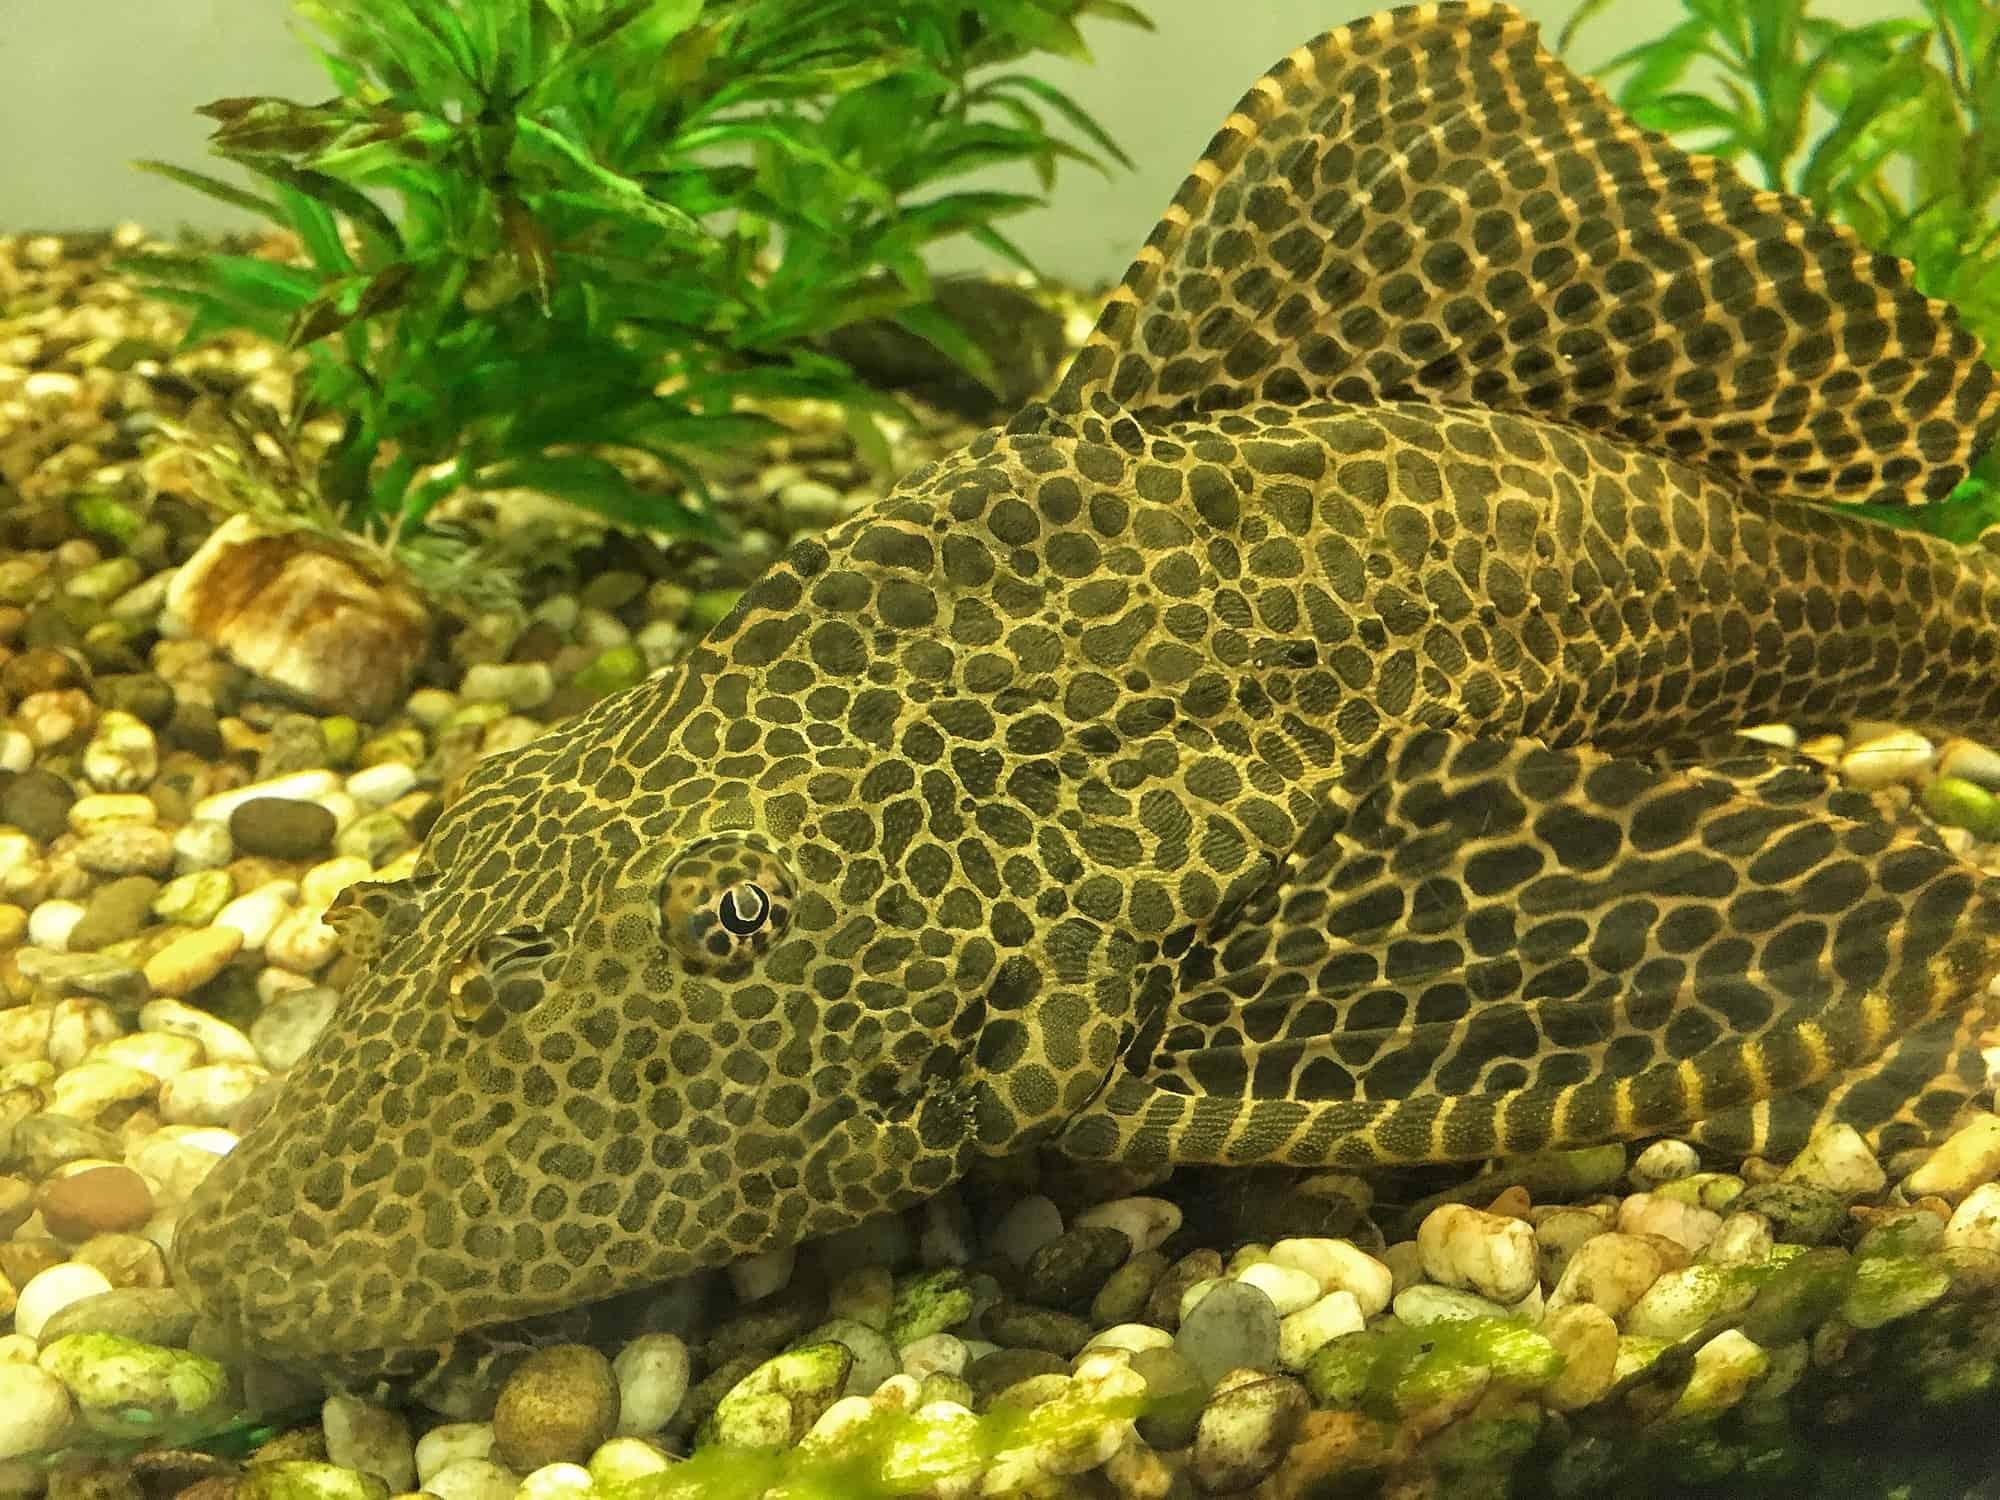 Antcistrus, spotted aquarium catfish close-up. Background for pet shop